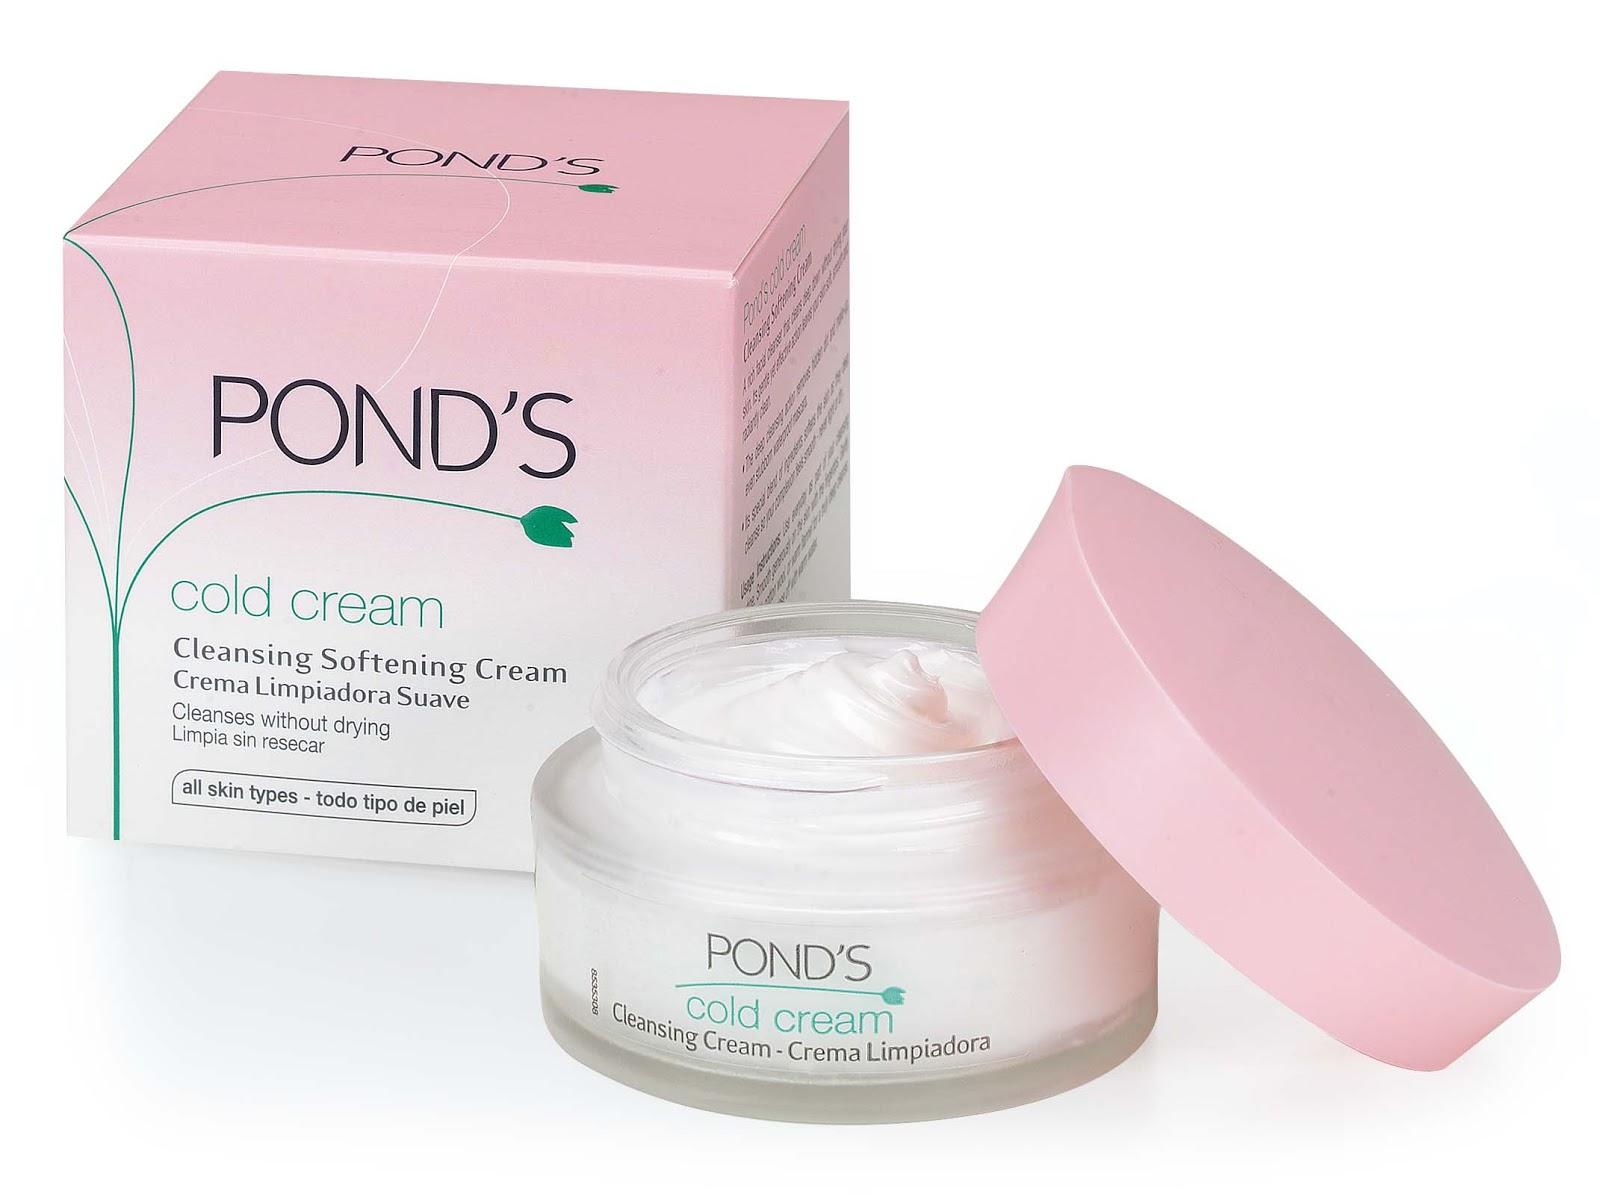 Ponds Cold Cream Cleanser.